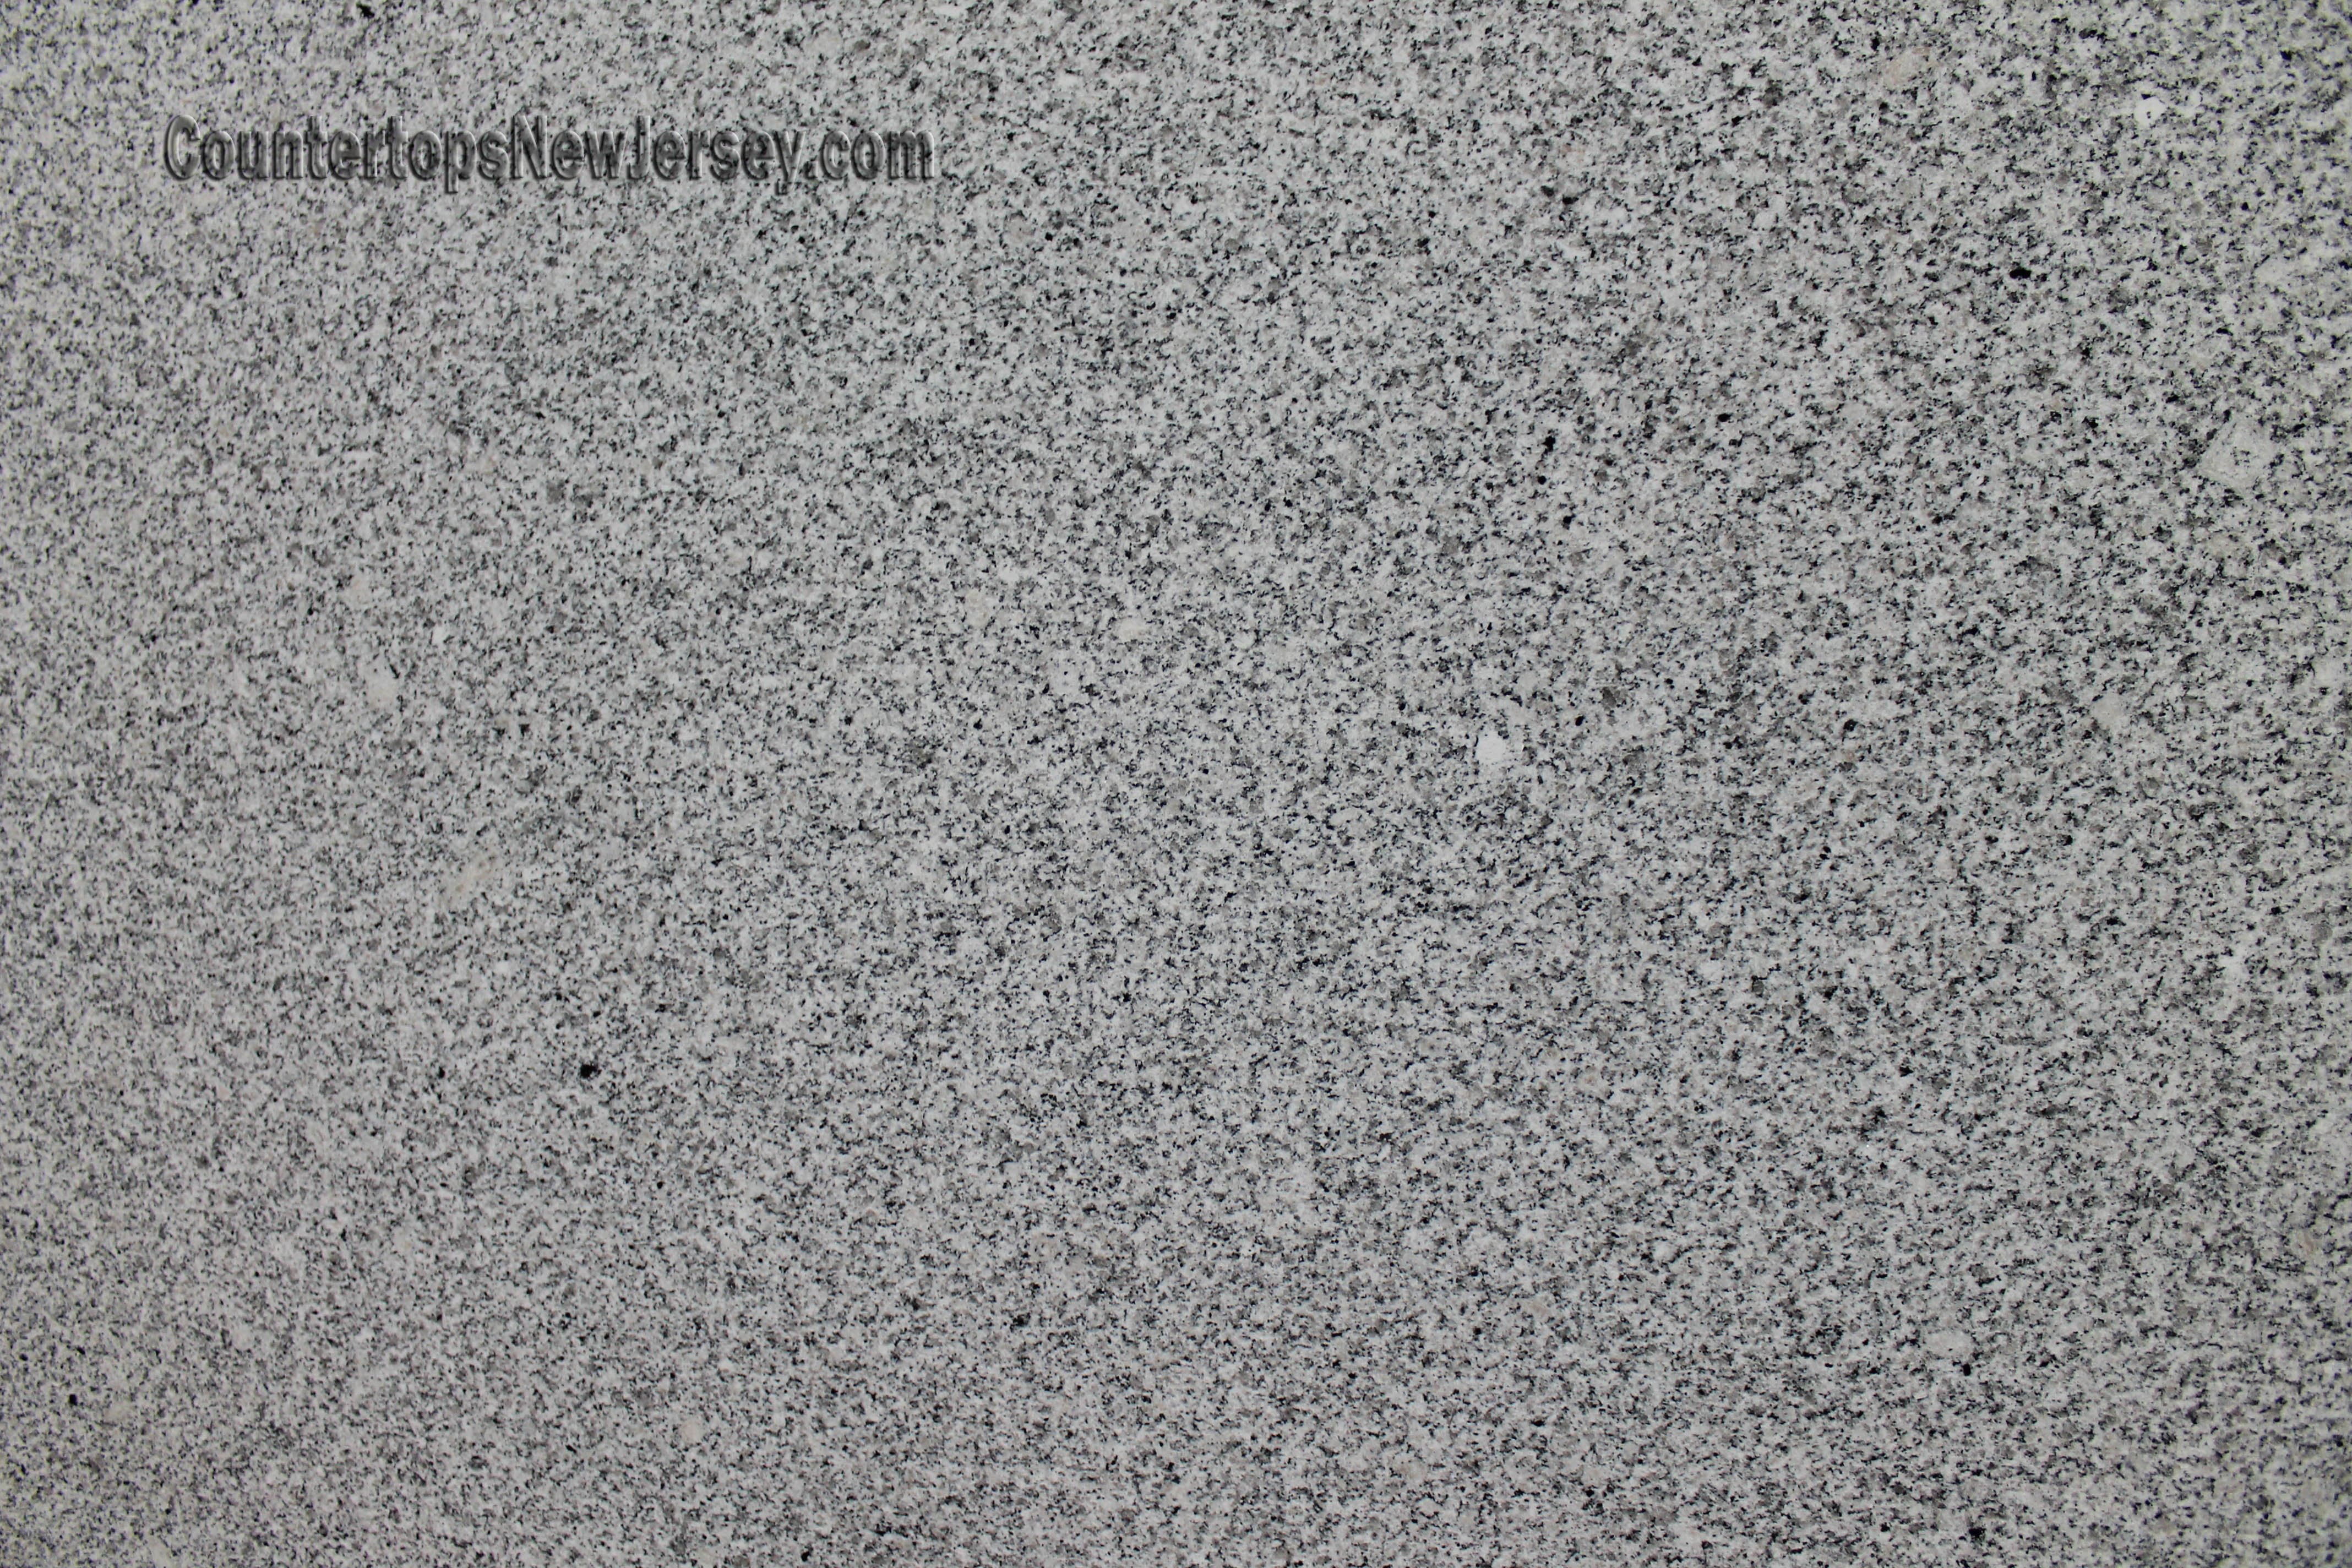 Bianco Catalina Granite : New granite and marble slab arrivals in nj countertops